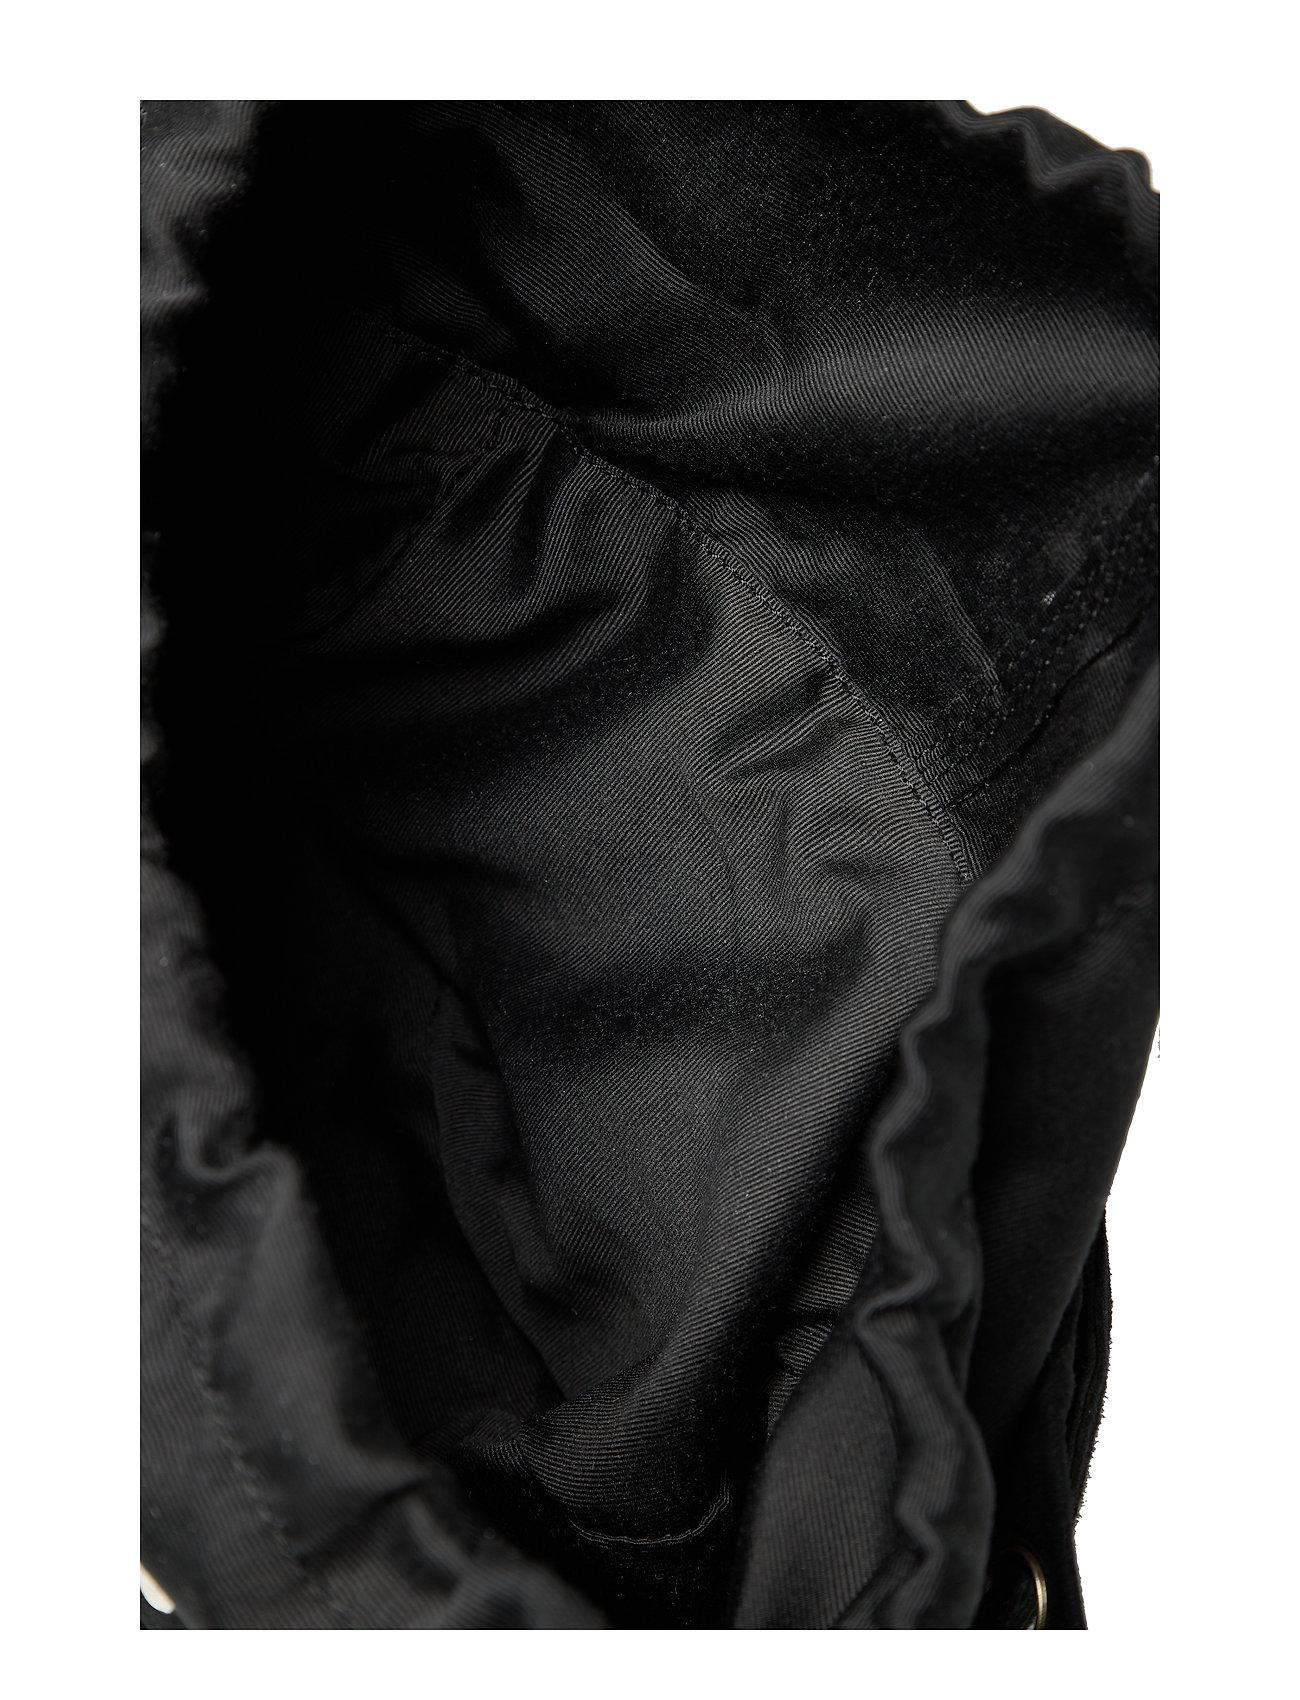 Mini Bow Bow Bow Mini Bag S S Ma18blackGestuz Mini S Bag Bag Ma18blackGestuz wk08nPXO